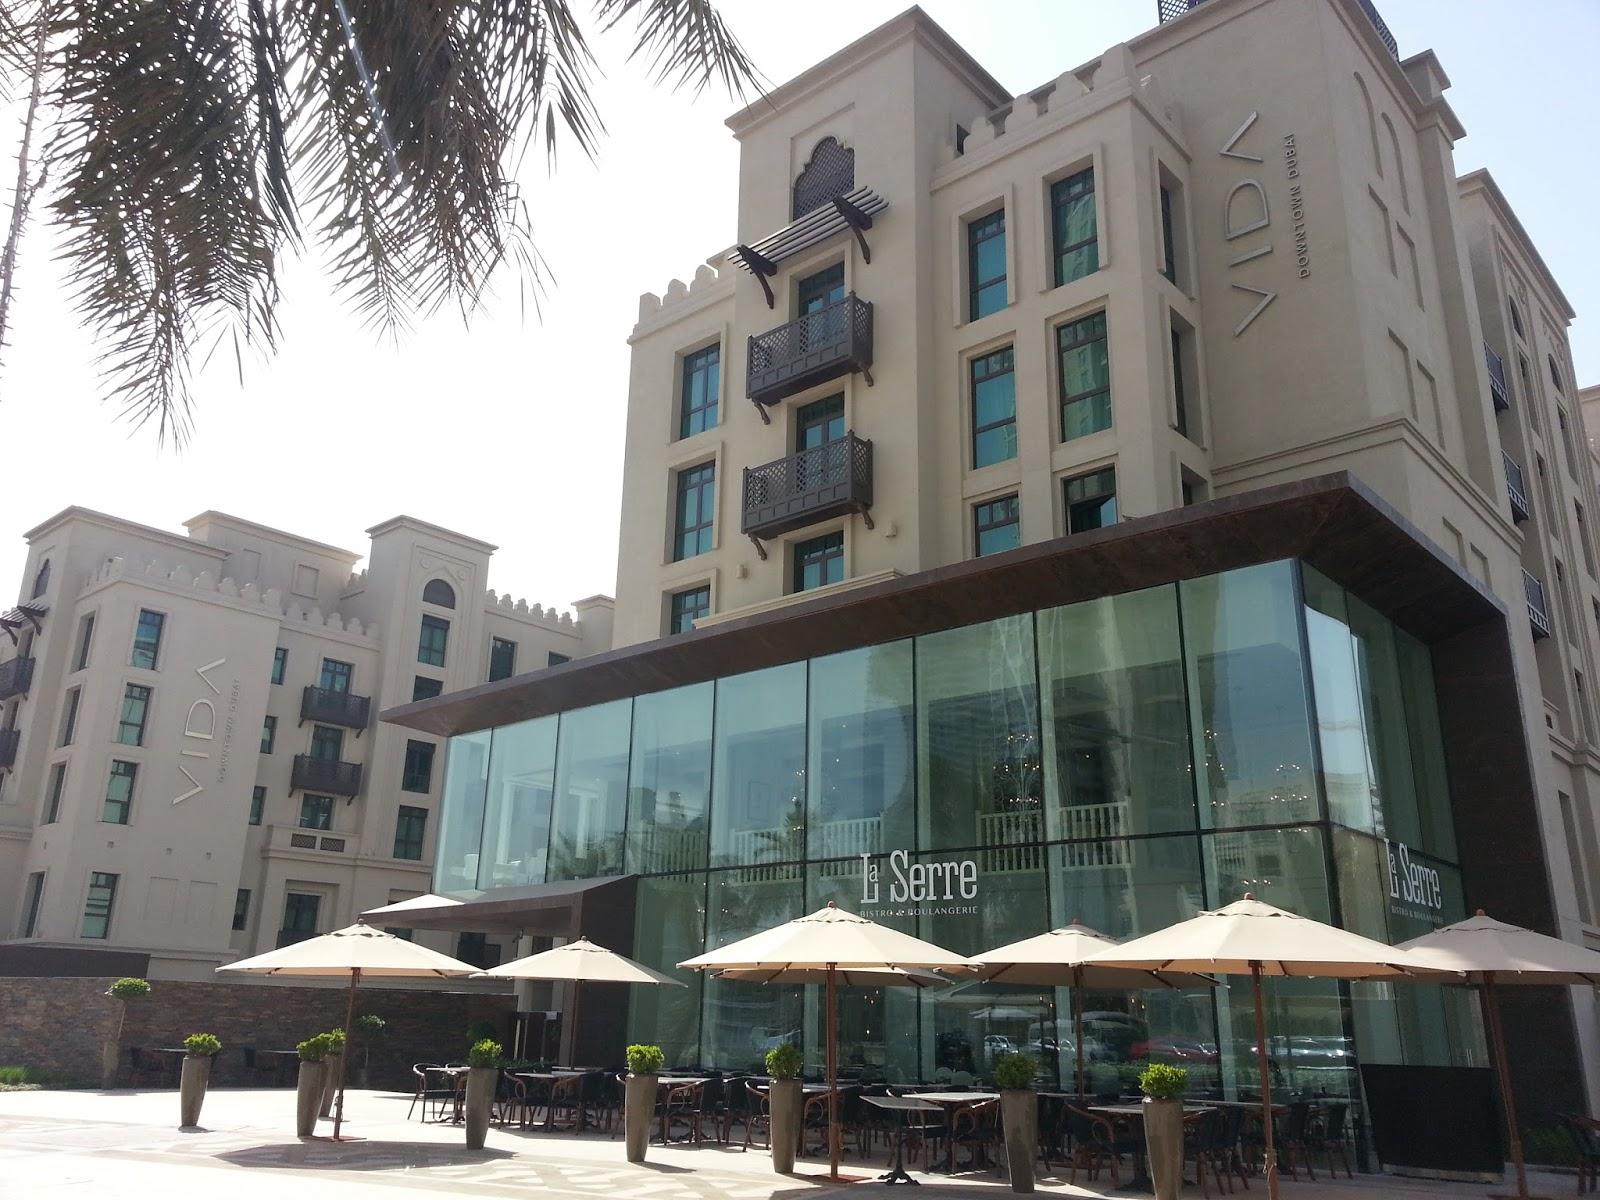 Solojetset the beautiful vida hotel in dubai for The most beautiful hotel in dubai